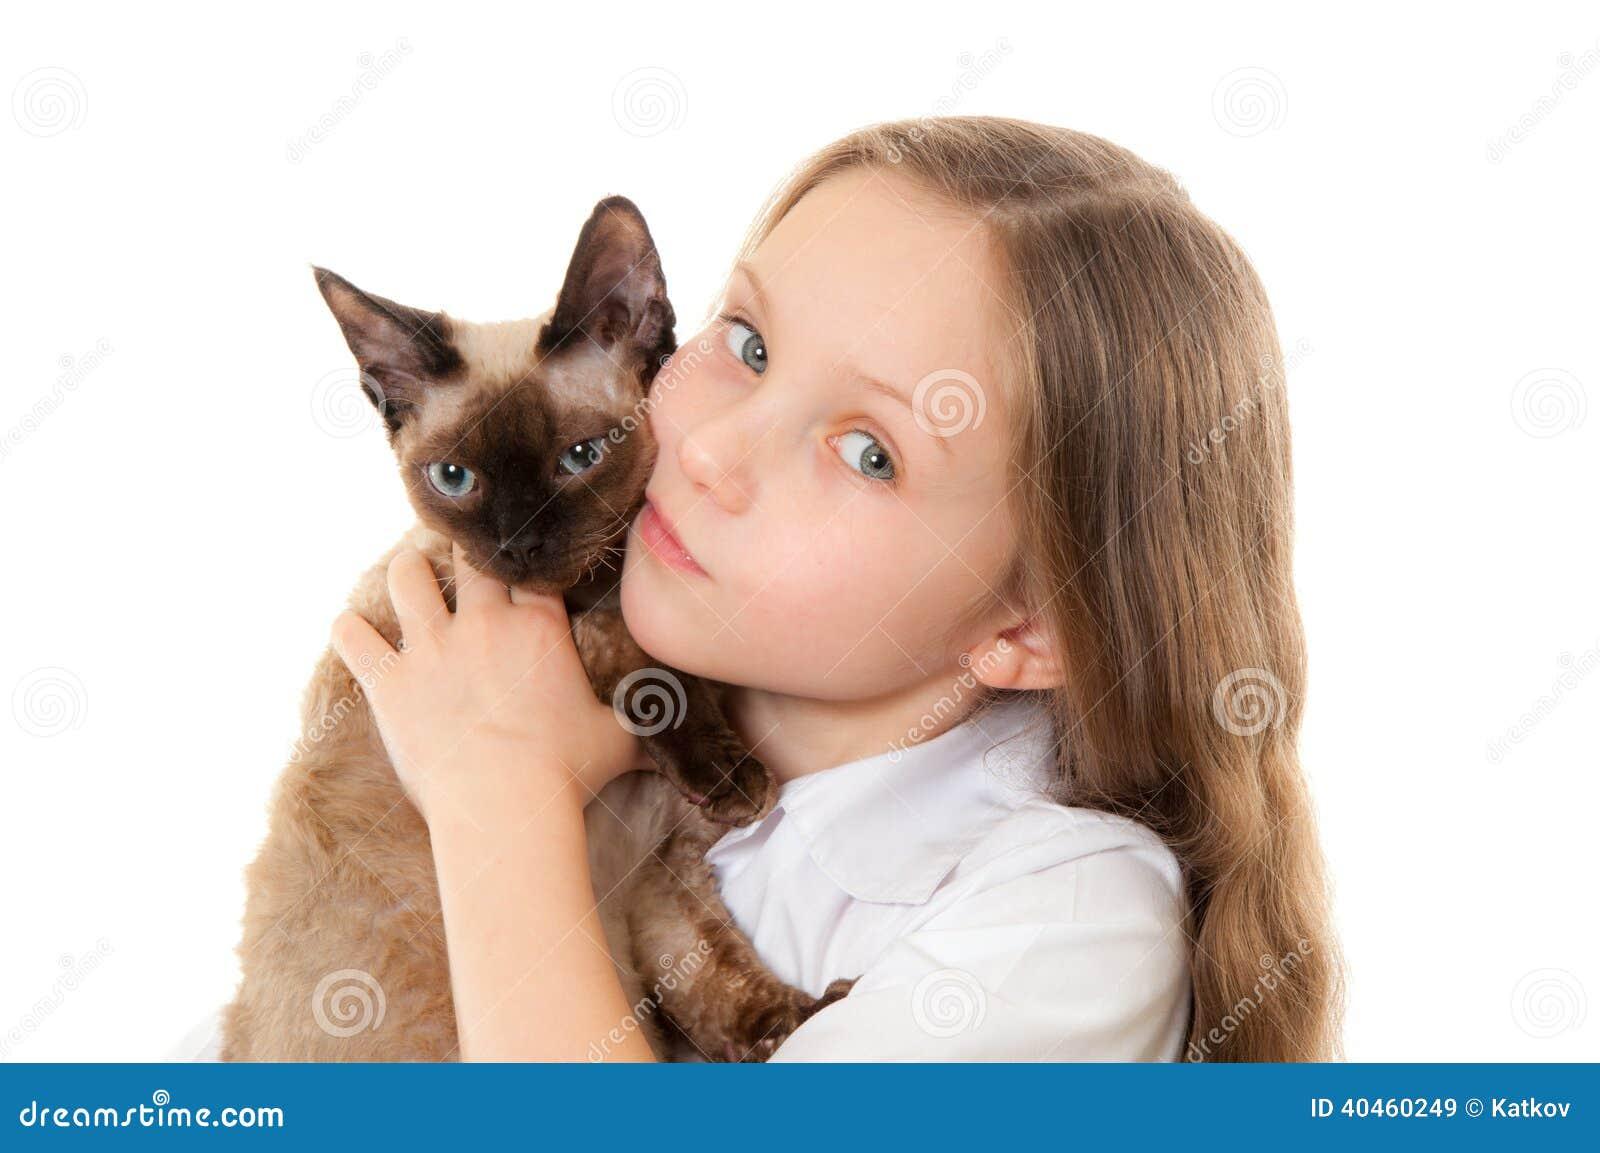 taking care of a kitten 101